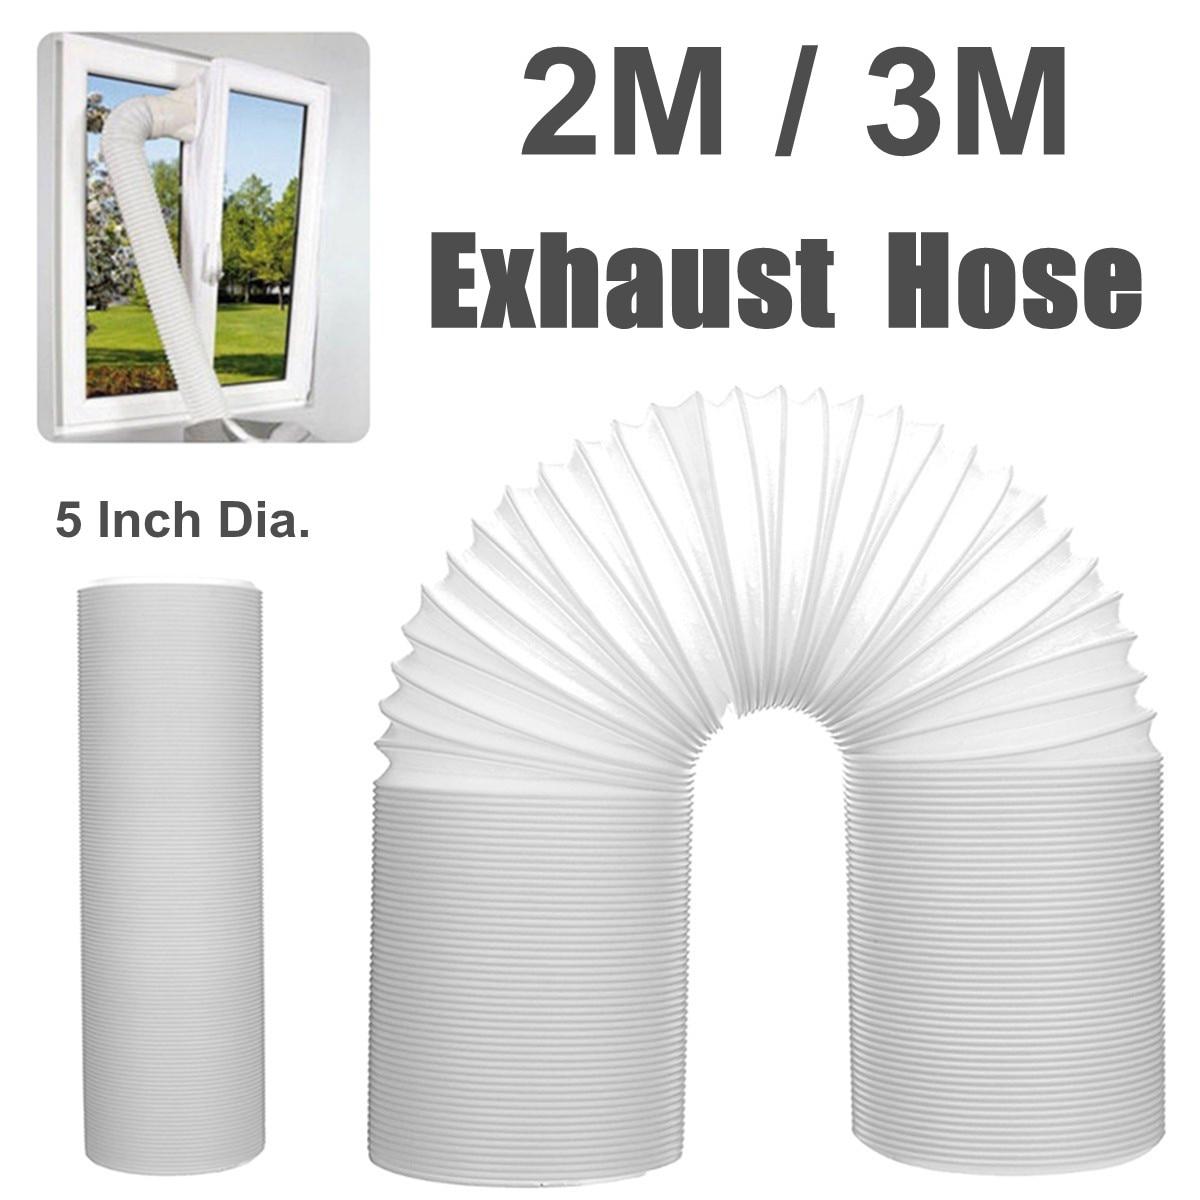 Tubo de manguera de aluminio de 3/2M, accesorios de cocina, tubo de Escape en línea, ventilador respiradero, mangueras, tubo de ventilación de 130mm de diámetro